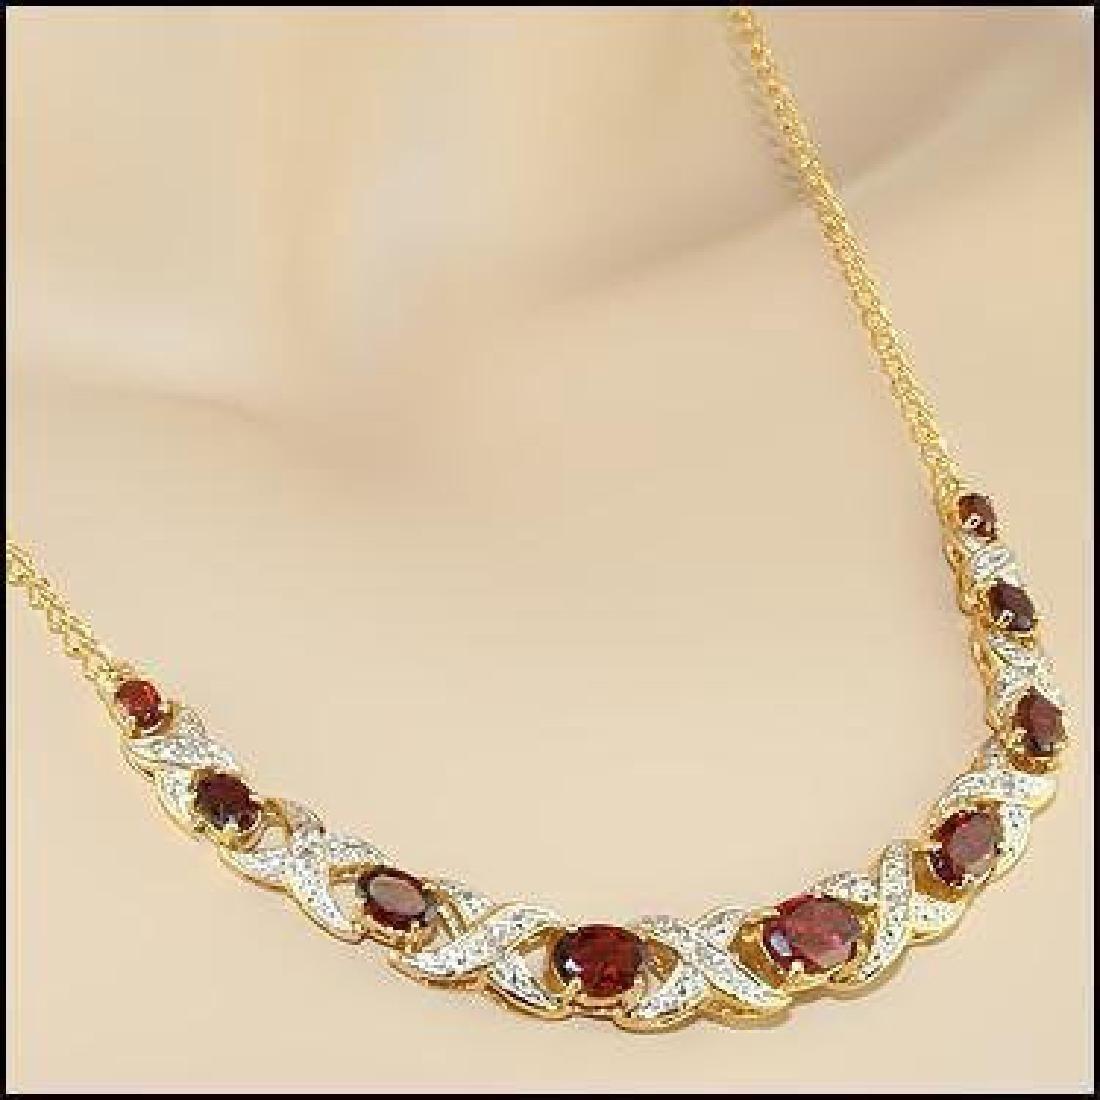 12.19 CT Garnet & Diamond Designer Necklace $1,335